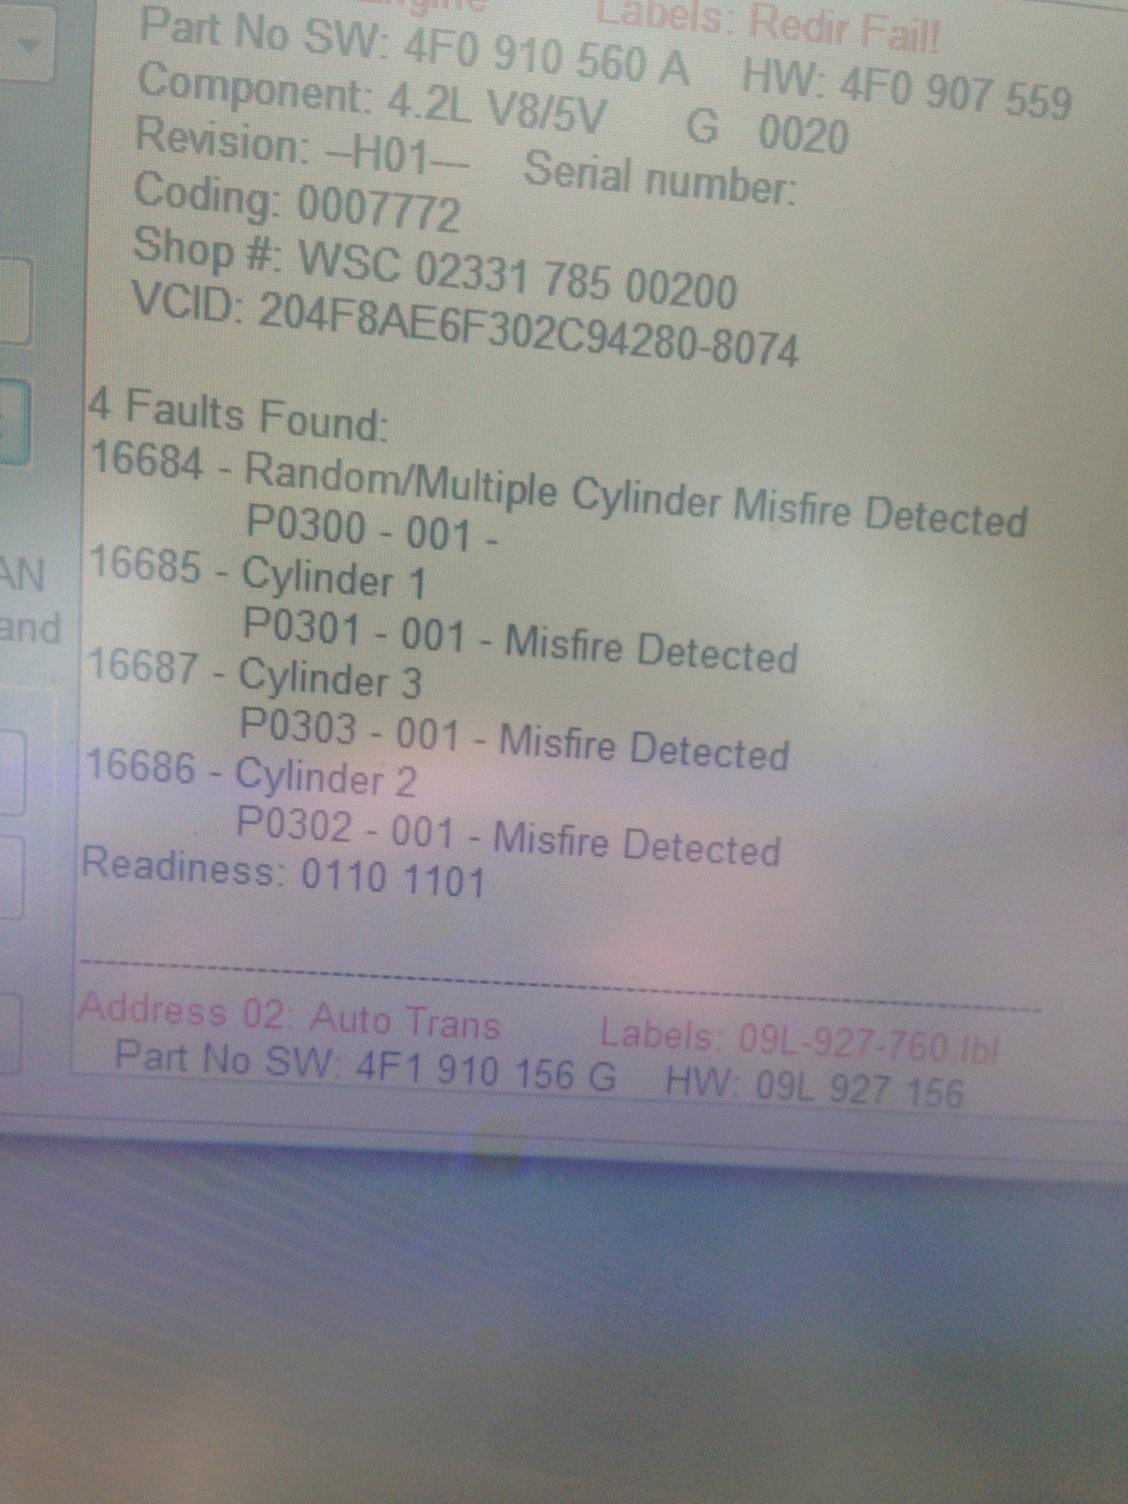 2005 A6 4 2 Cylinder 1, 2, 3 misfires - Page 3 - AudiWorld Forums